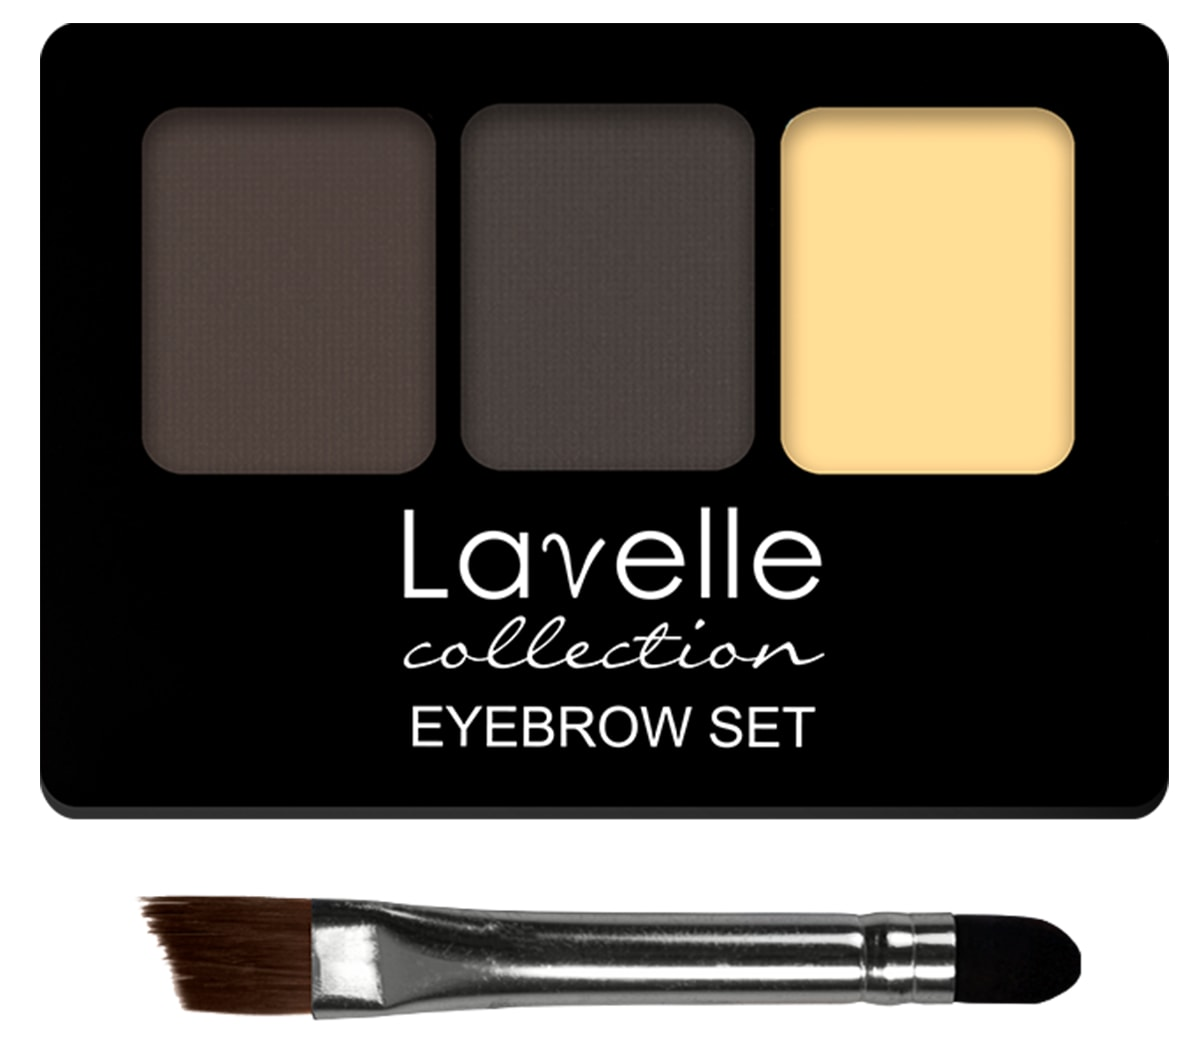 Lavelle Collection Набор для бровей (тени_воск) BS-01 тон 03 21,5г